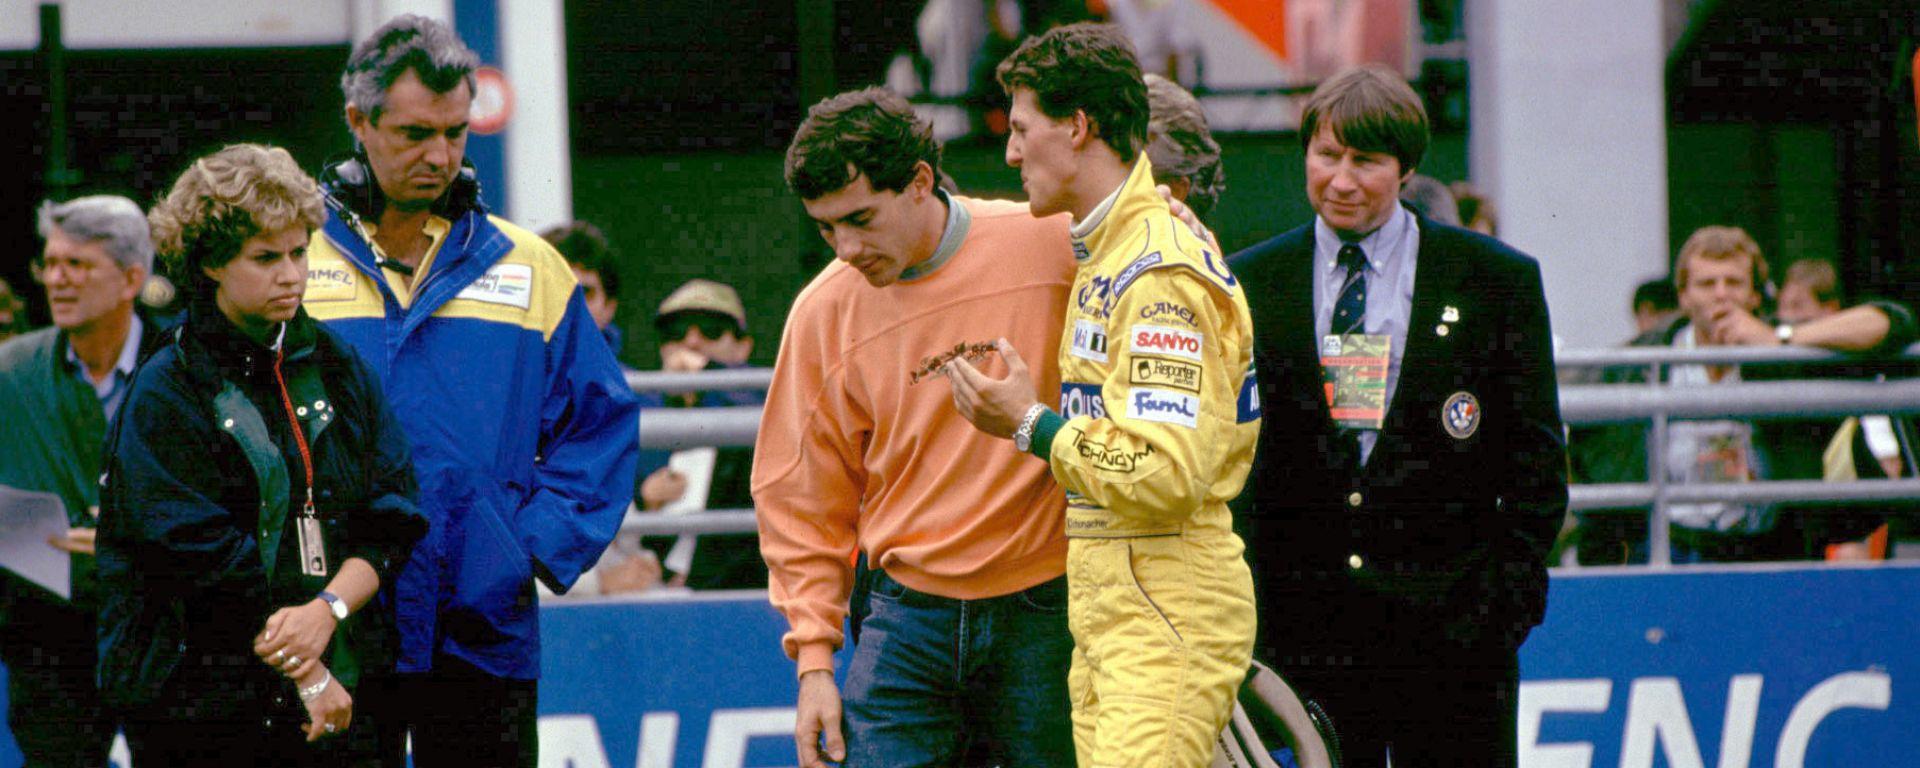 F1, Ayrton Senna e Michael Schumacher